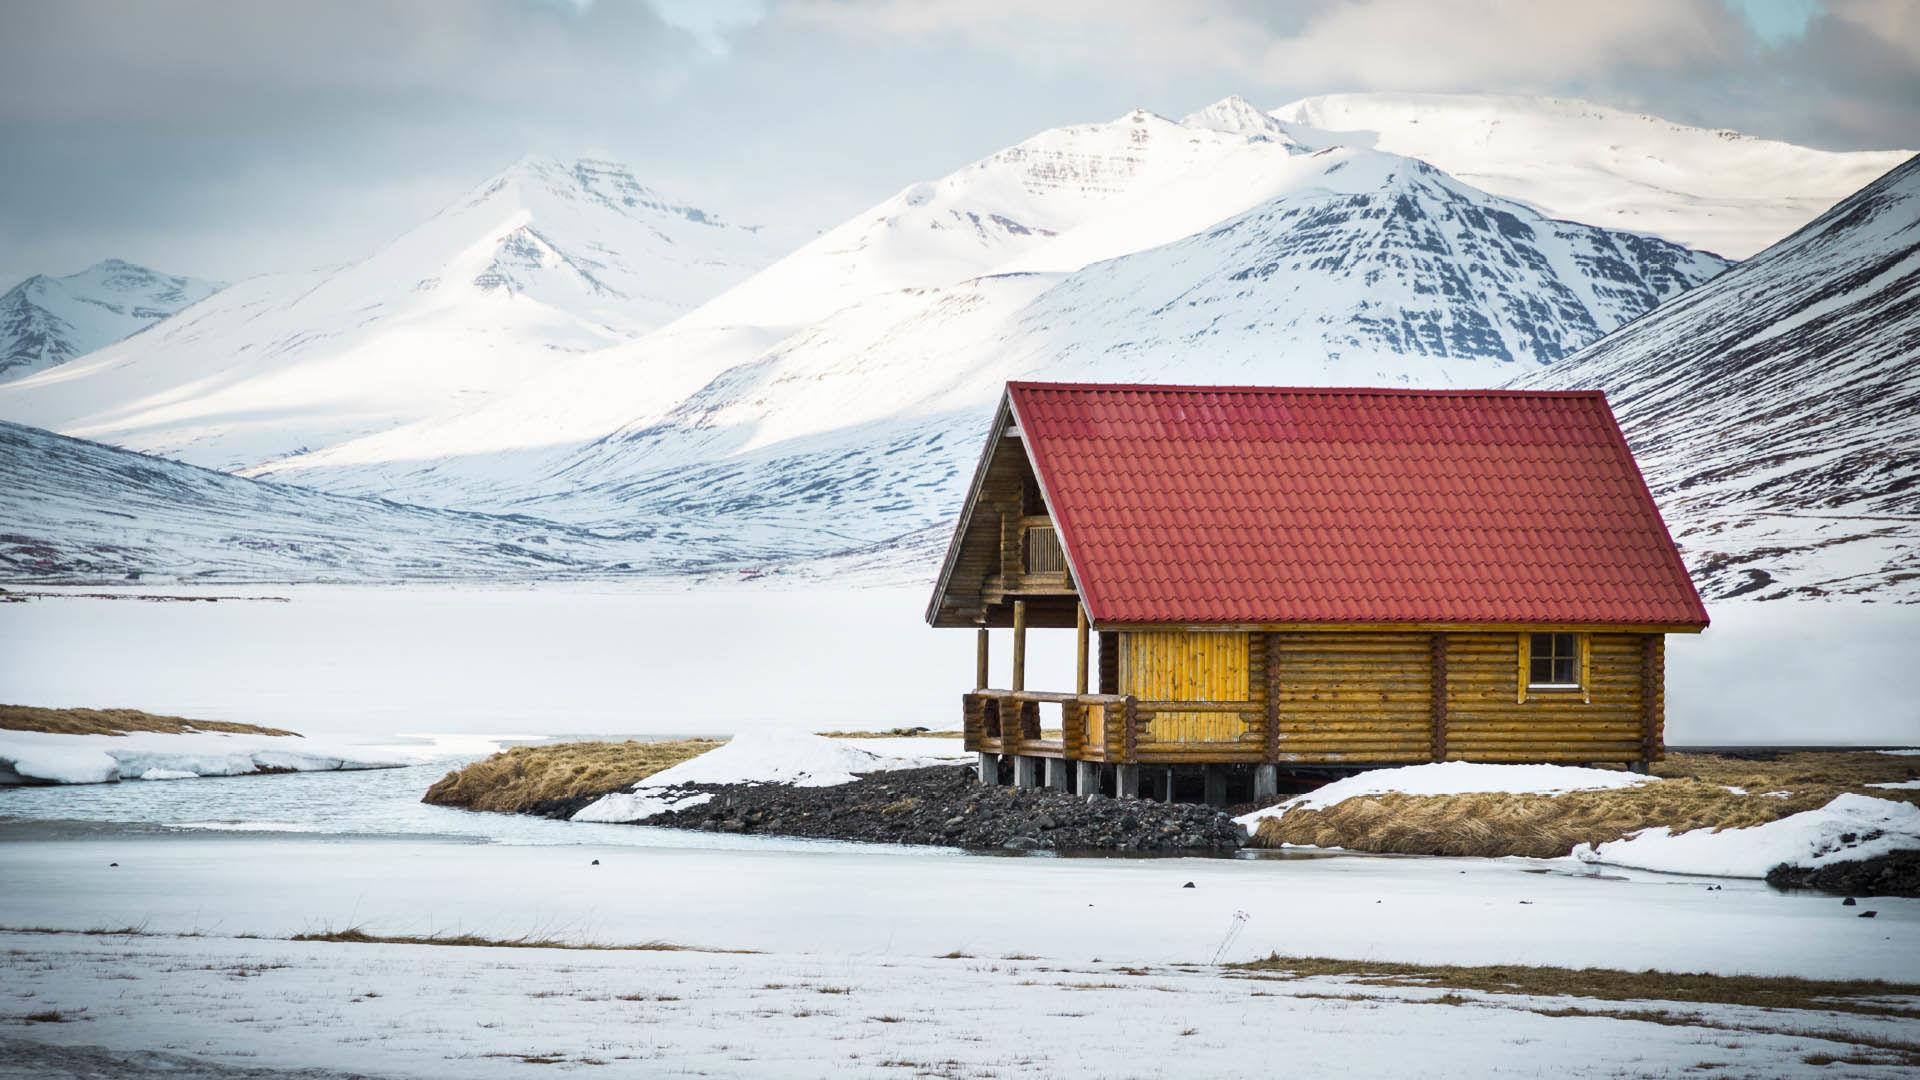 Skitourenreise Island Olafsfjordur Alpinewelten Bergfuehrer Lodge